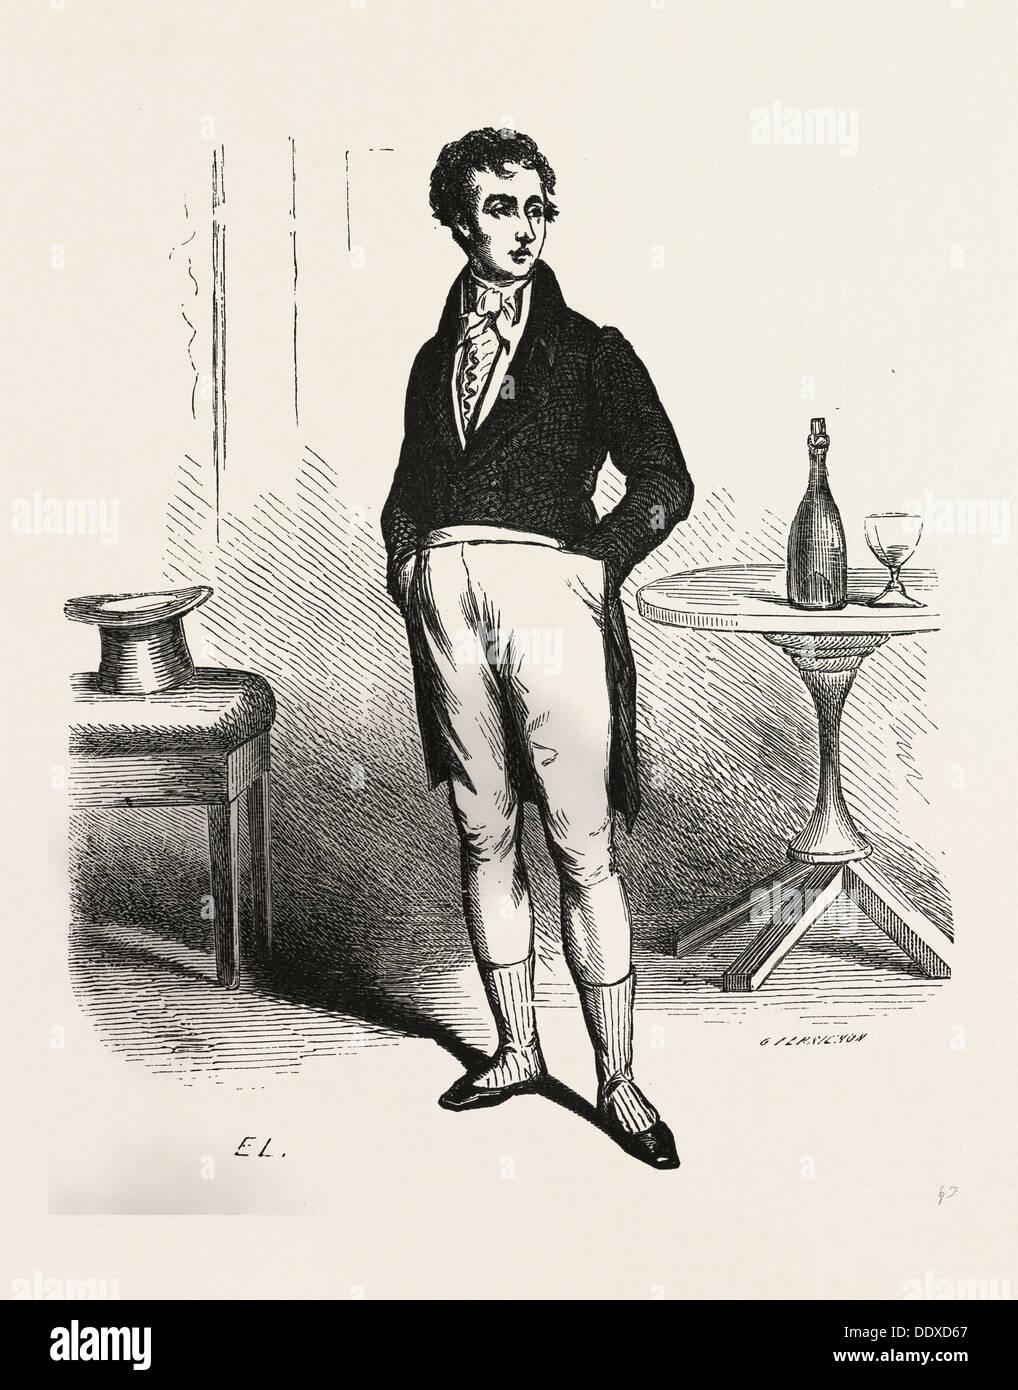 Francois Picaud, Alexander Dumas, 19. Jahrhundert, Liszt Gourmet-Archiv, Flasche, Glas, Tisch, Mann, Hut Stockbild